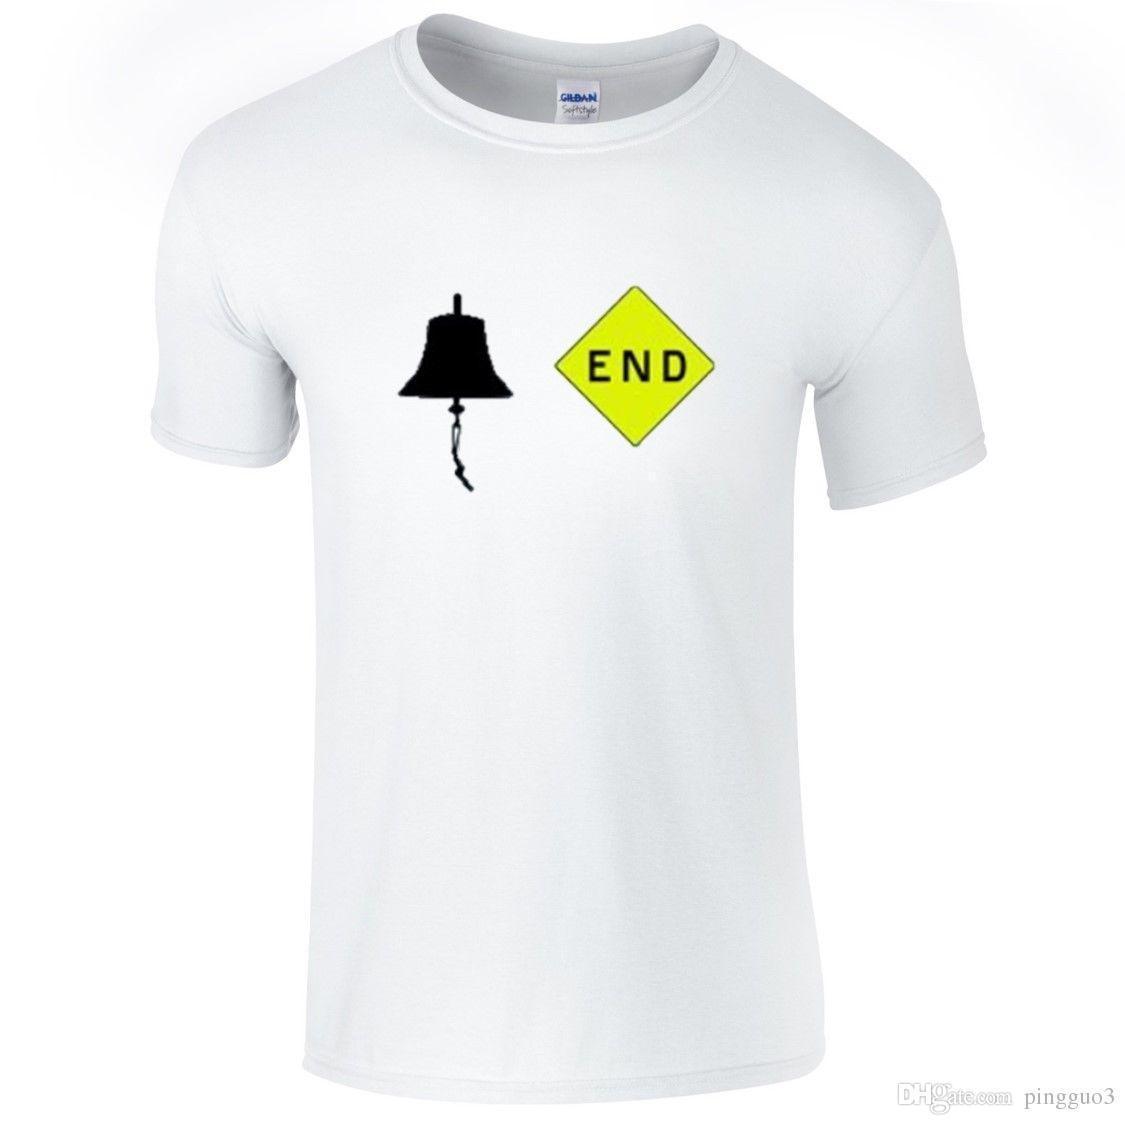 Offensive adult t shirt